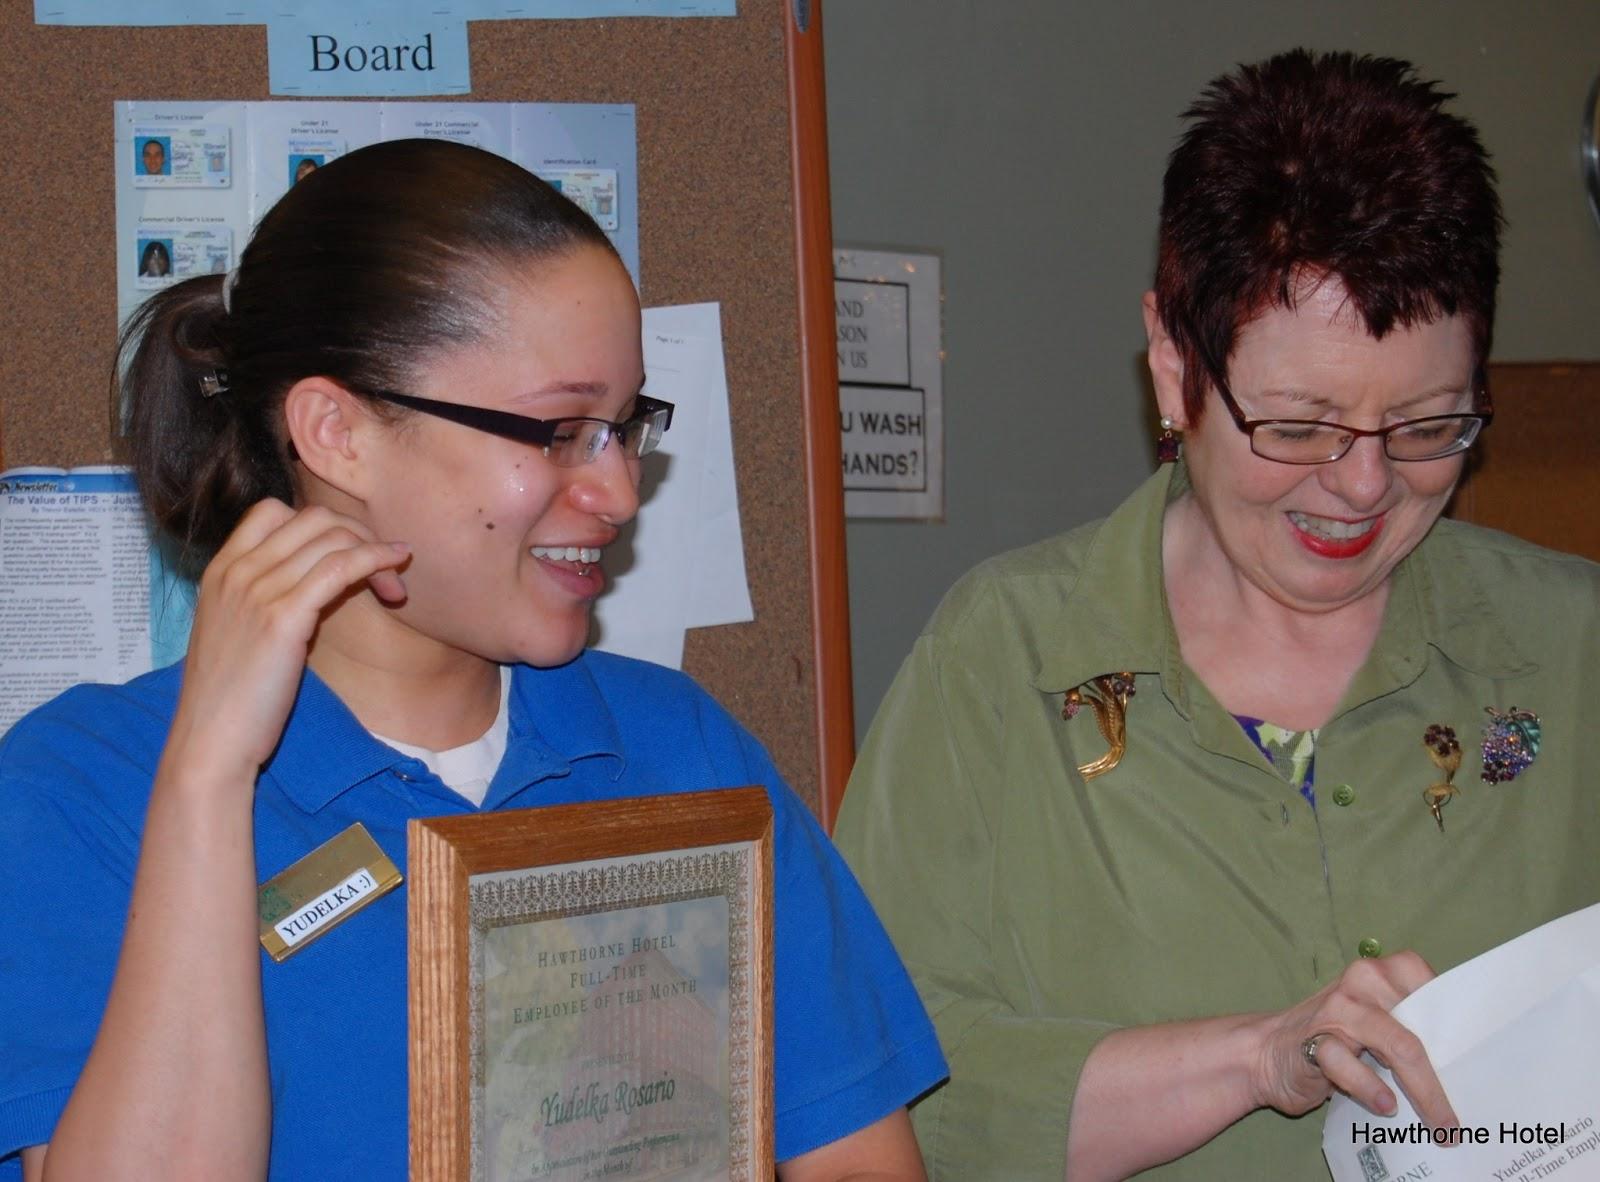 Top dental care implants, Invisalign Clifton, NJ â €